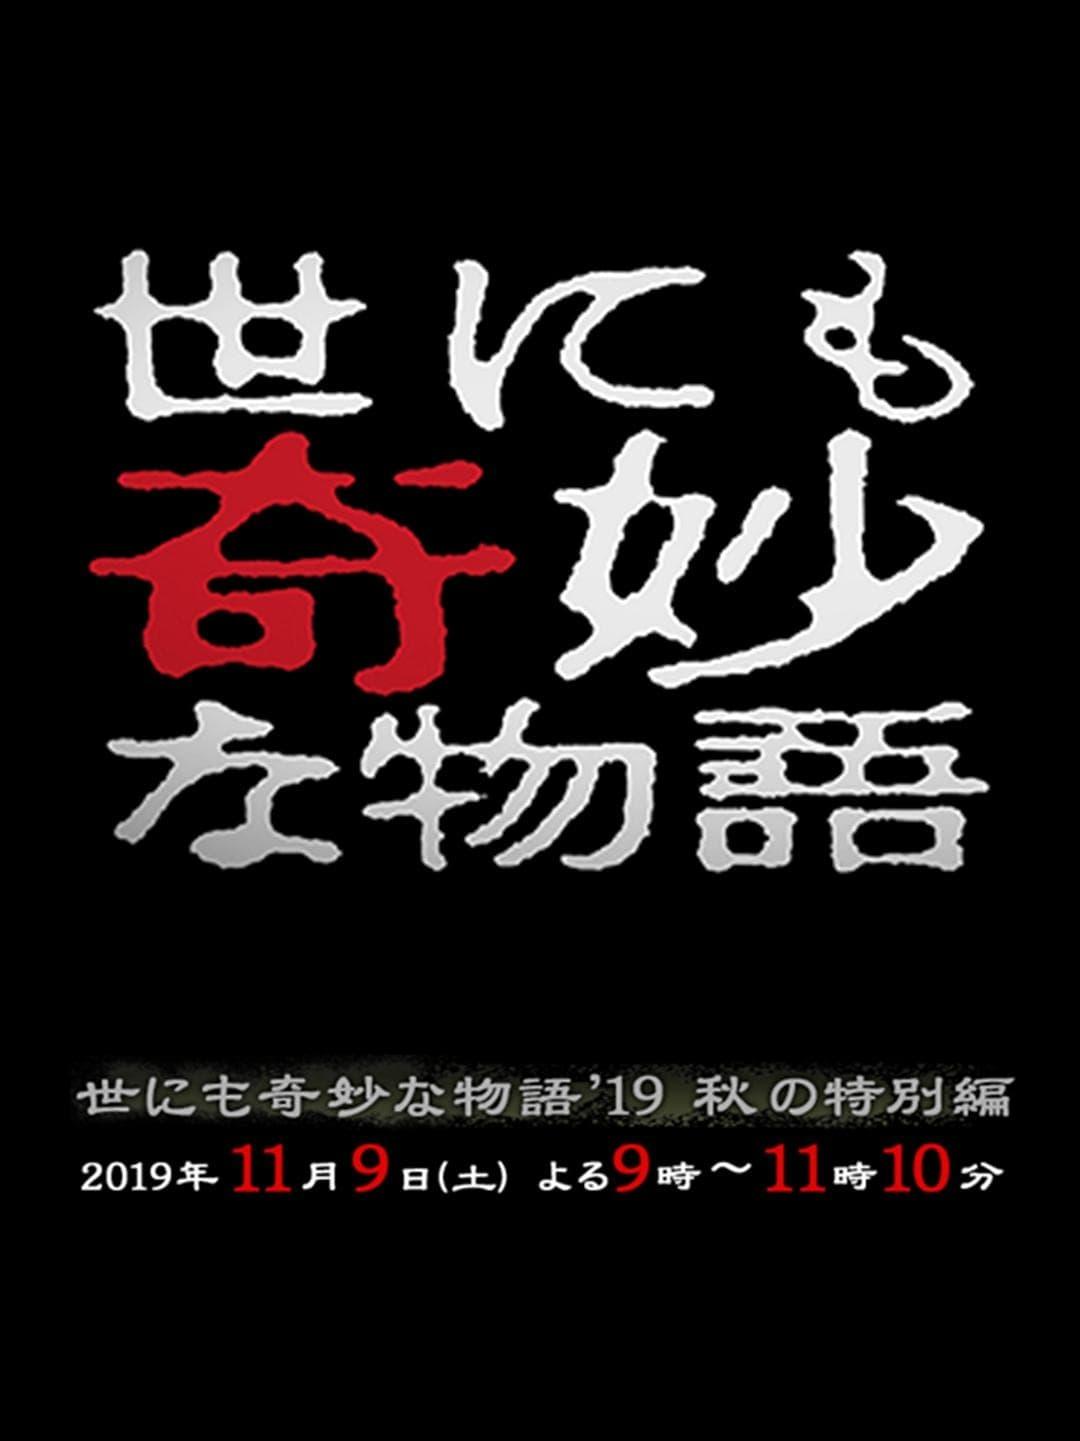 Yo nimo Kimyou na Monogatari: 2019 Fall Special